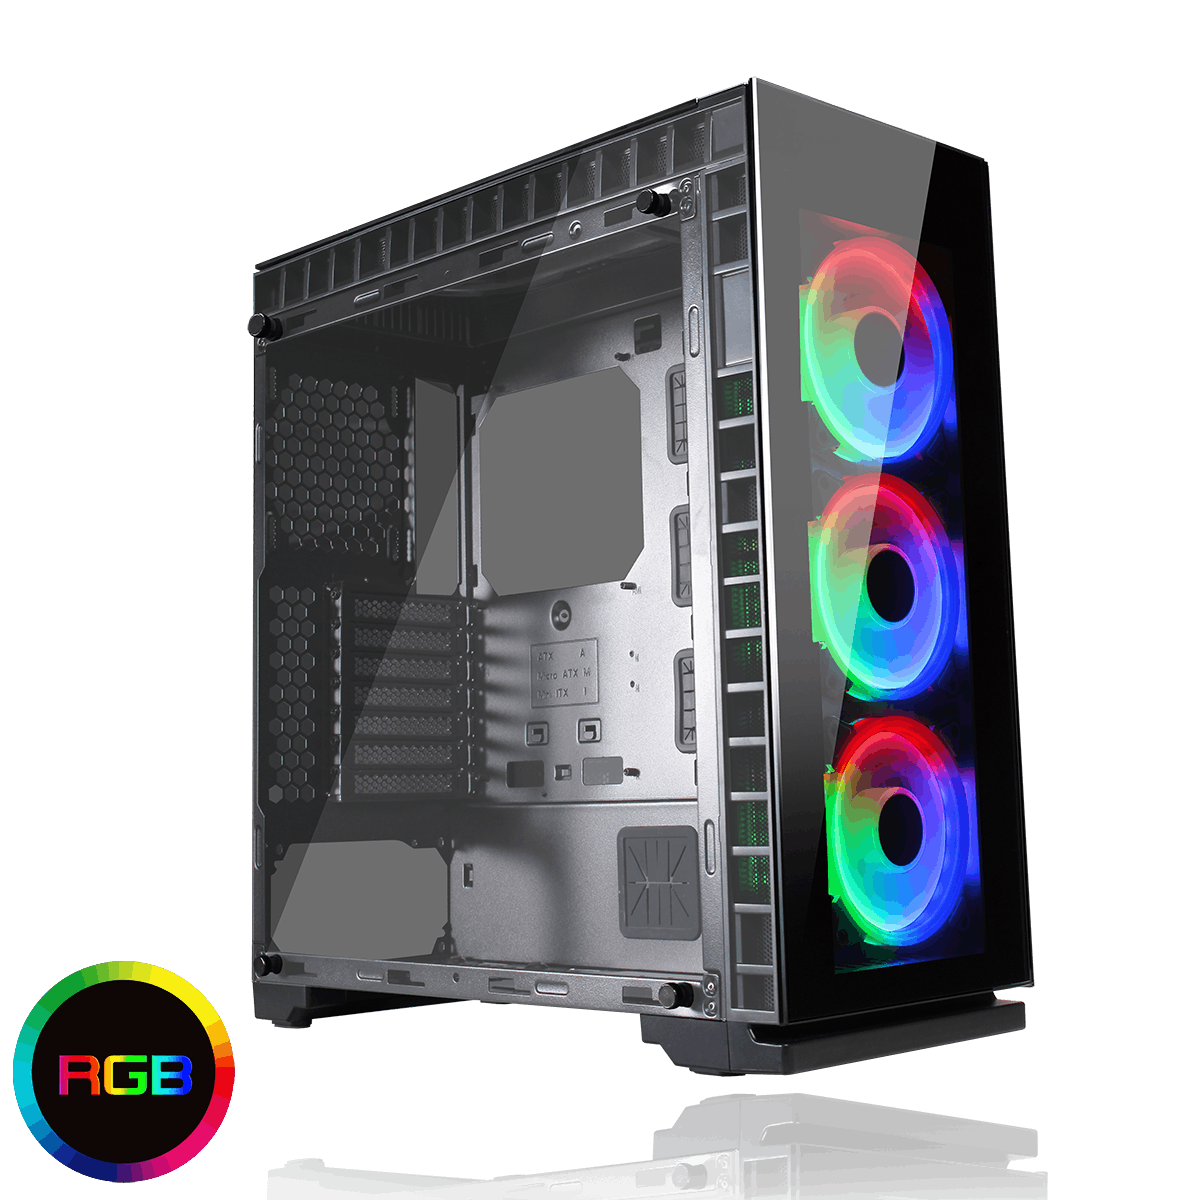 Gamemax Spectrum Tempered Glass RGB Gaming Case